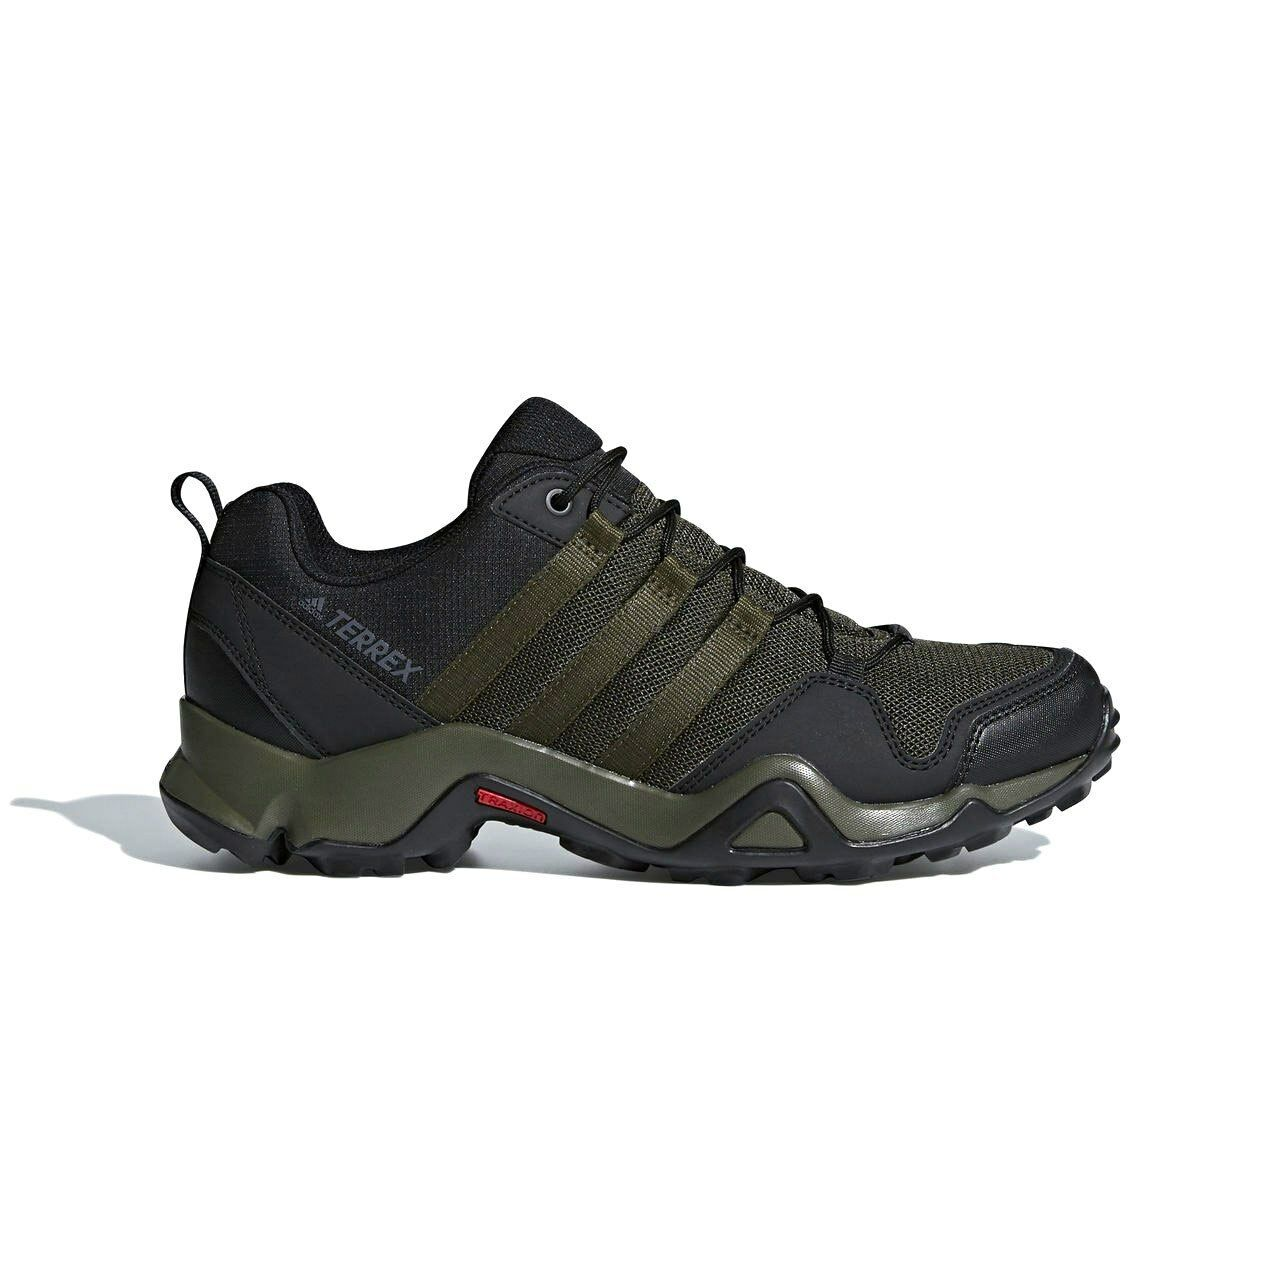 Adidas Men's Outdoor Terrex AX2R Night Cargo    Base Green shoes - AC8034  are doing discount activities